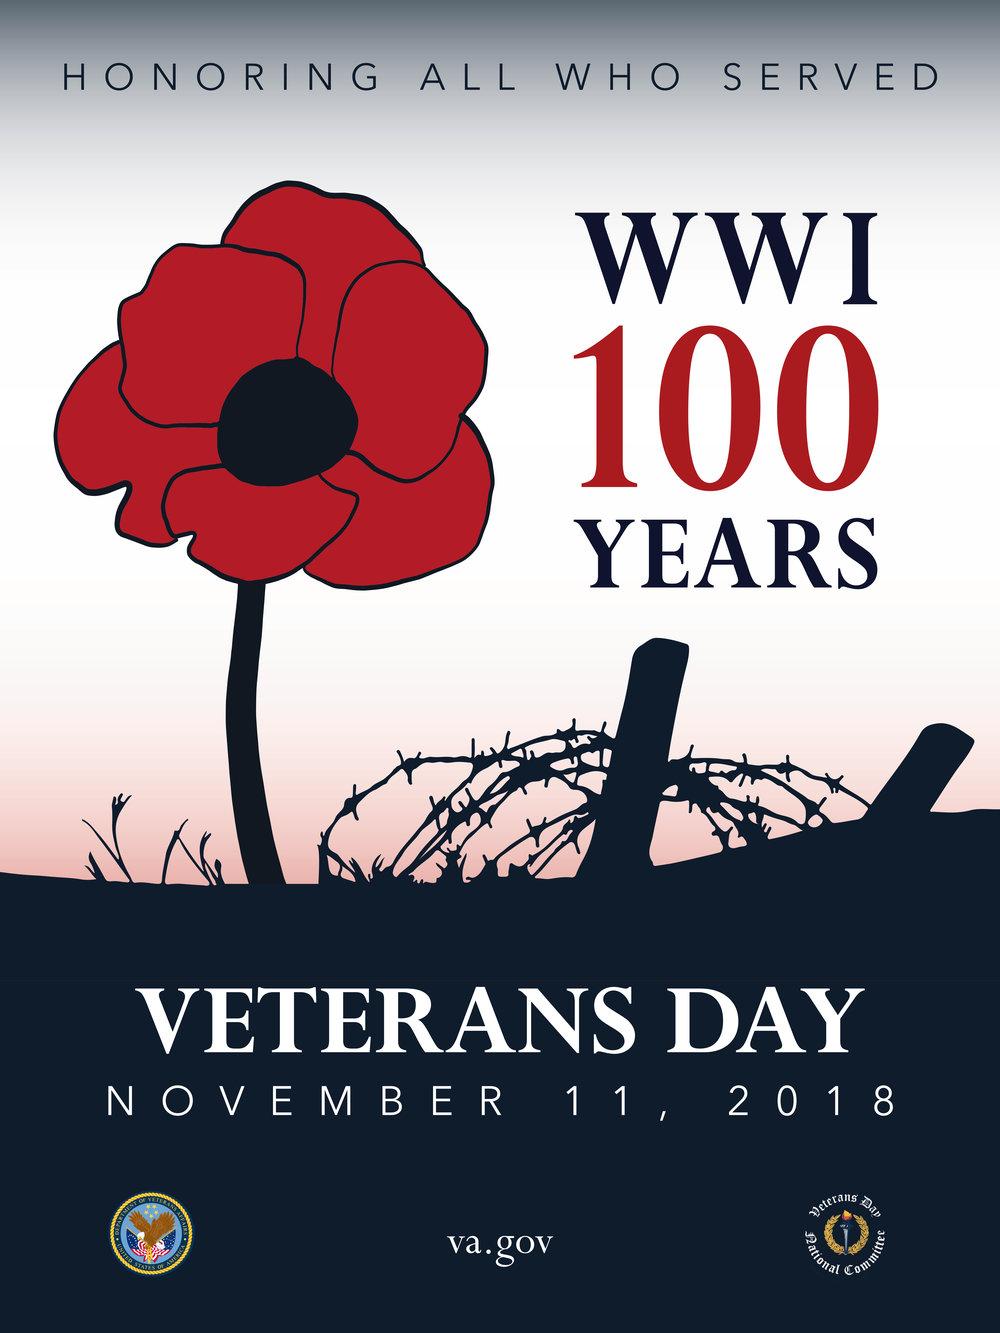 Image Courtesy of United States Veterans Administration